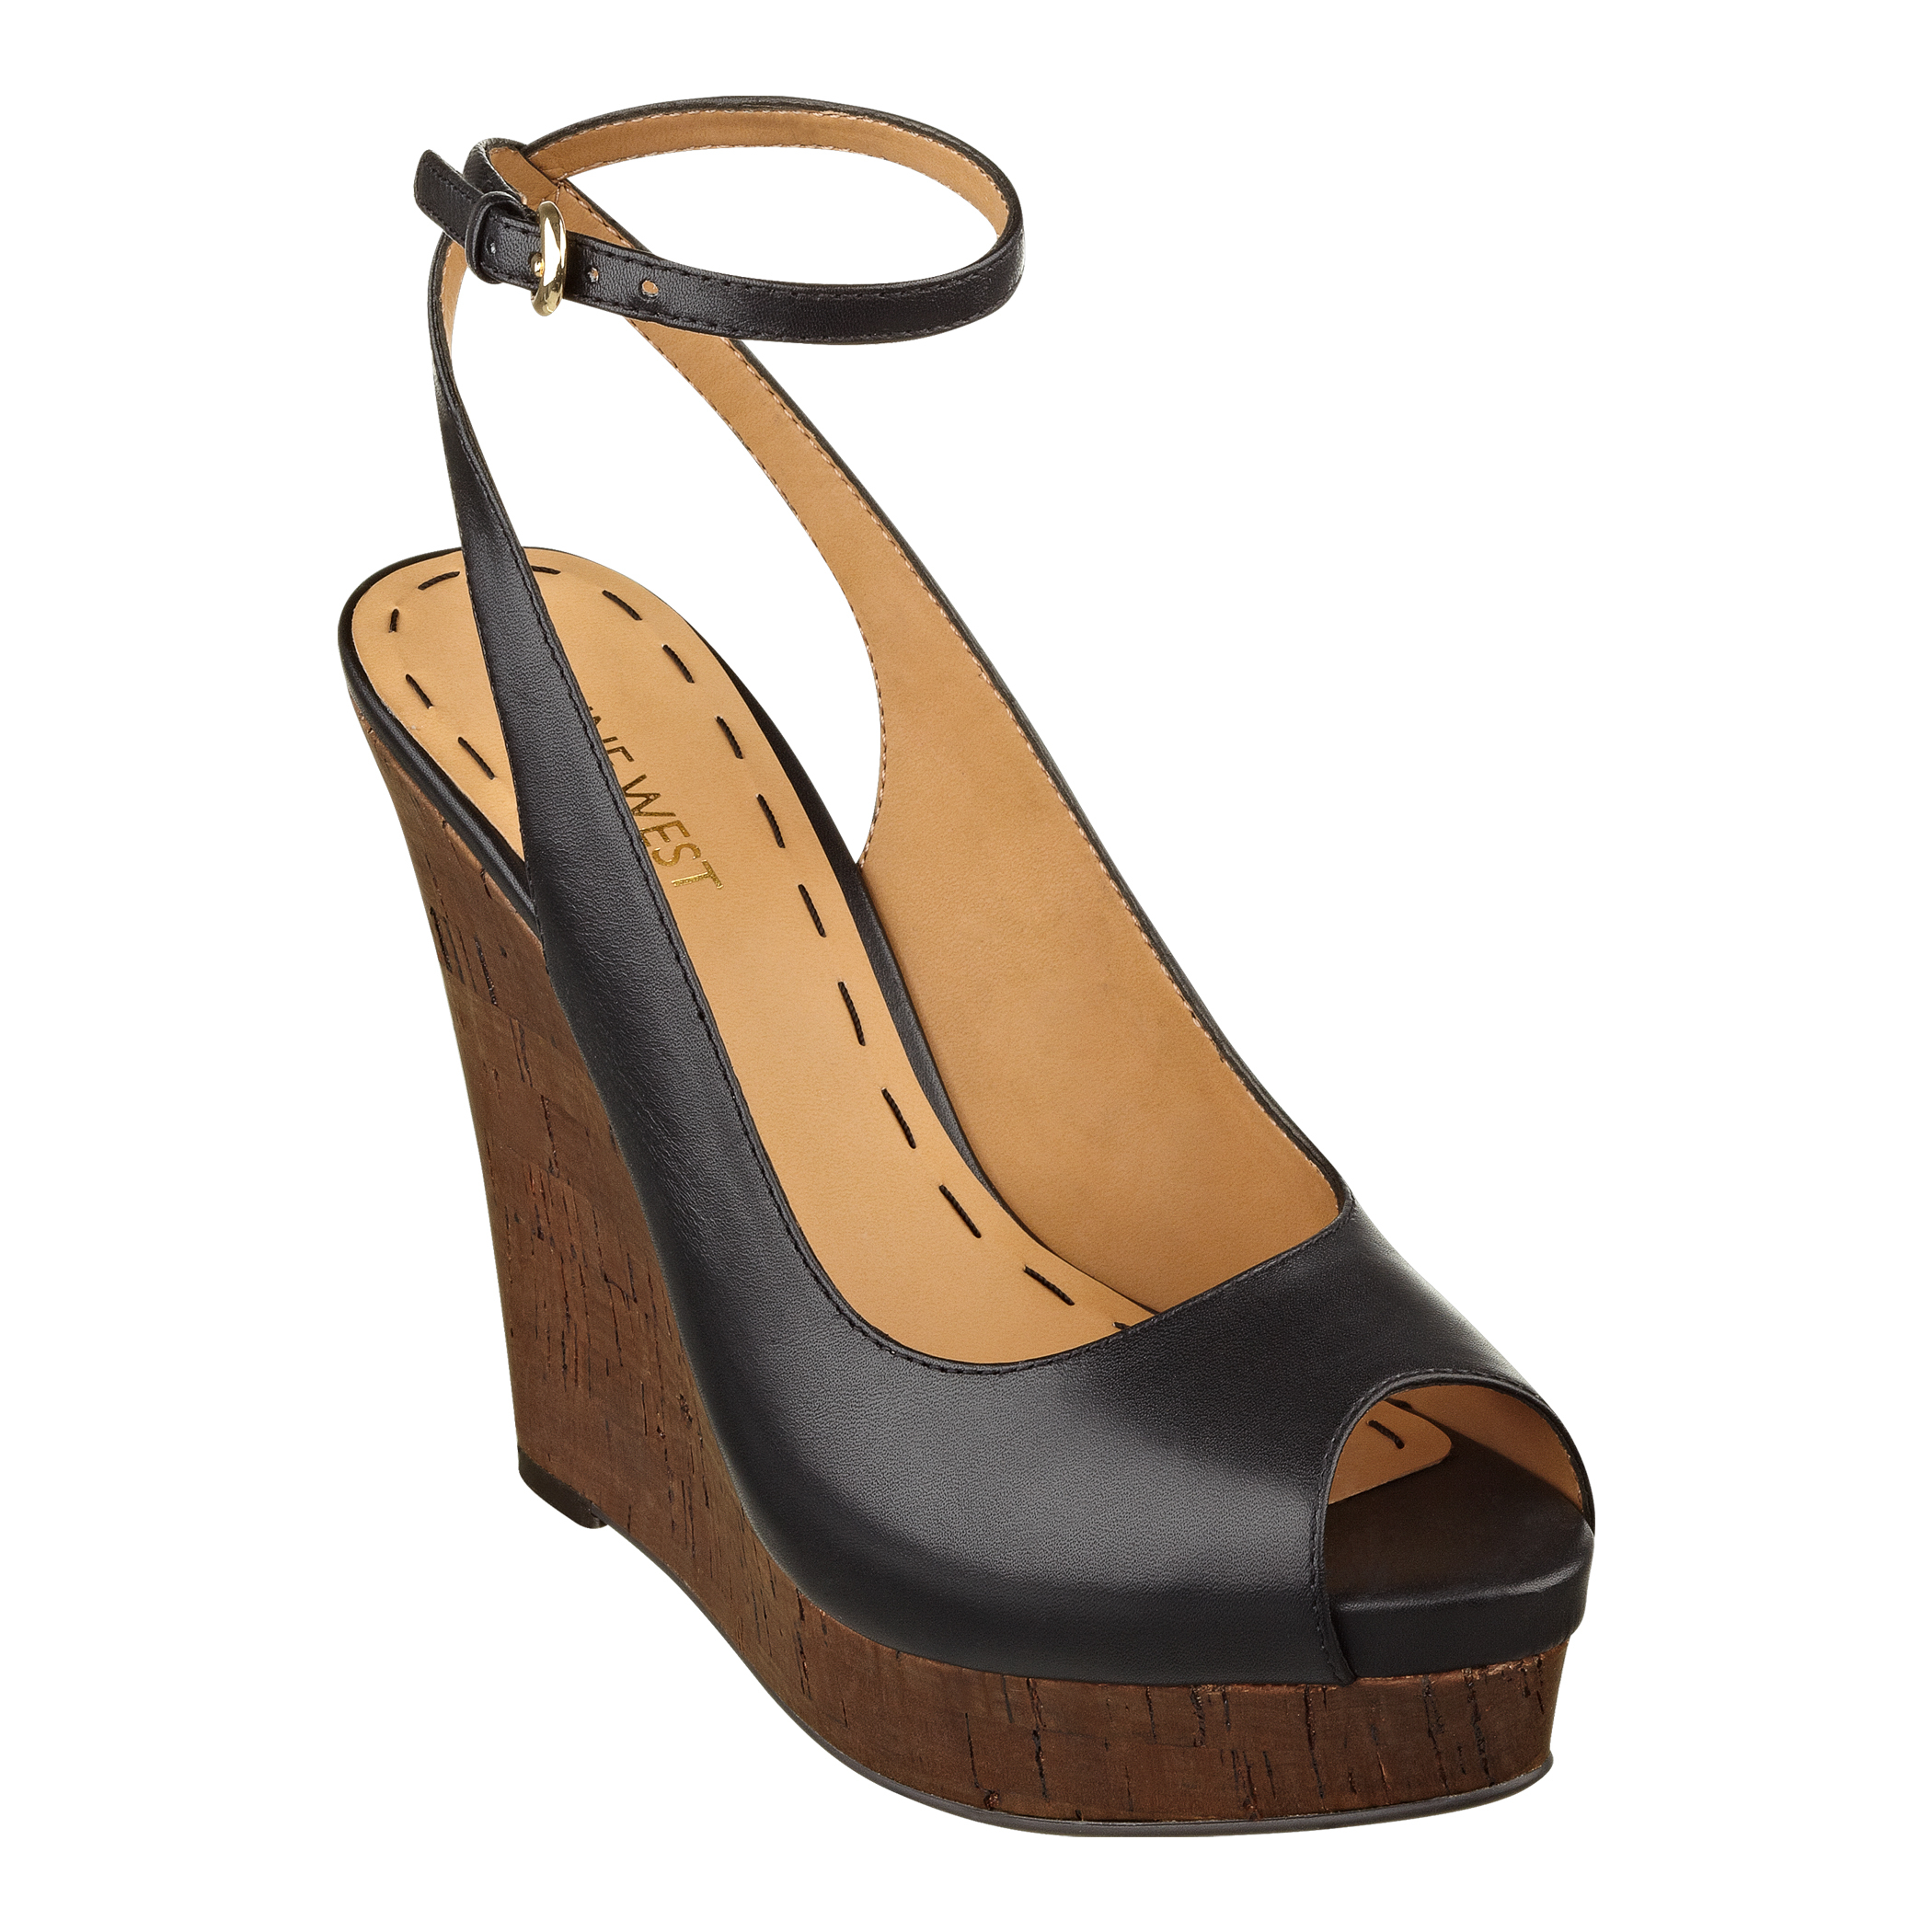 Nine West Peep Toe Wedge Shoes